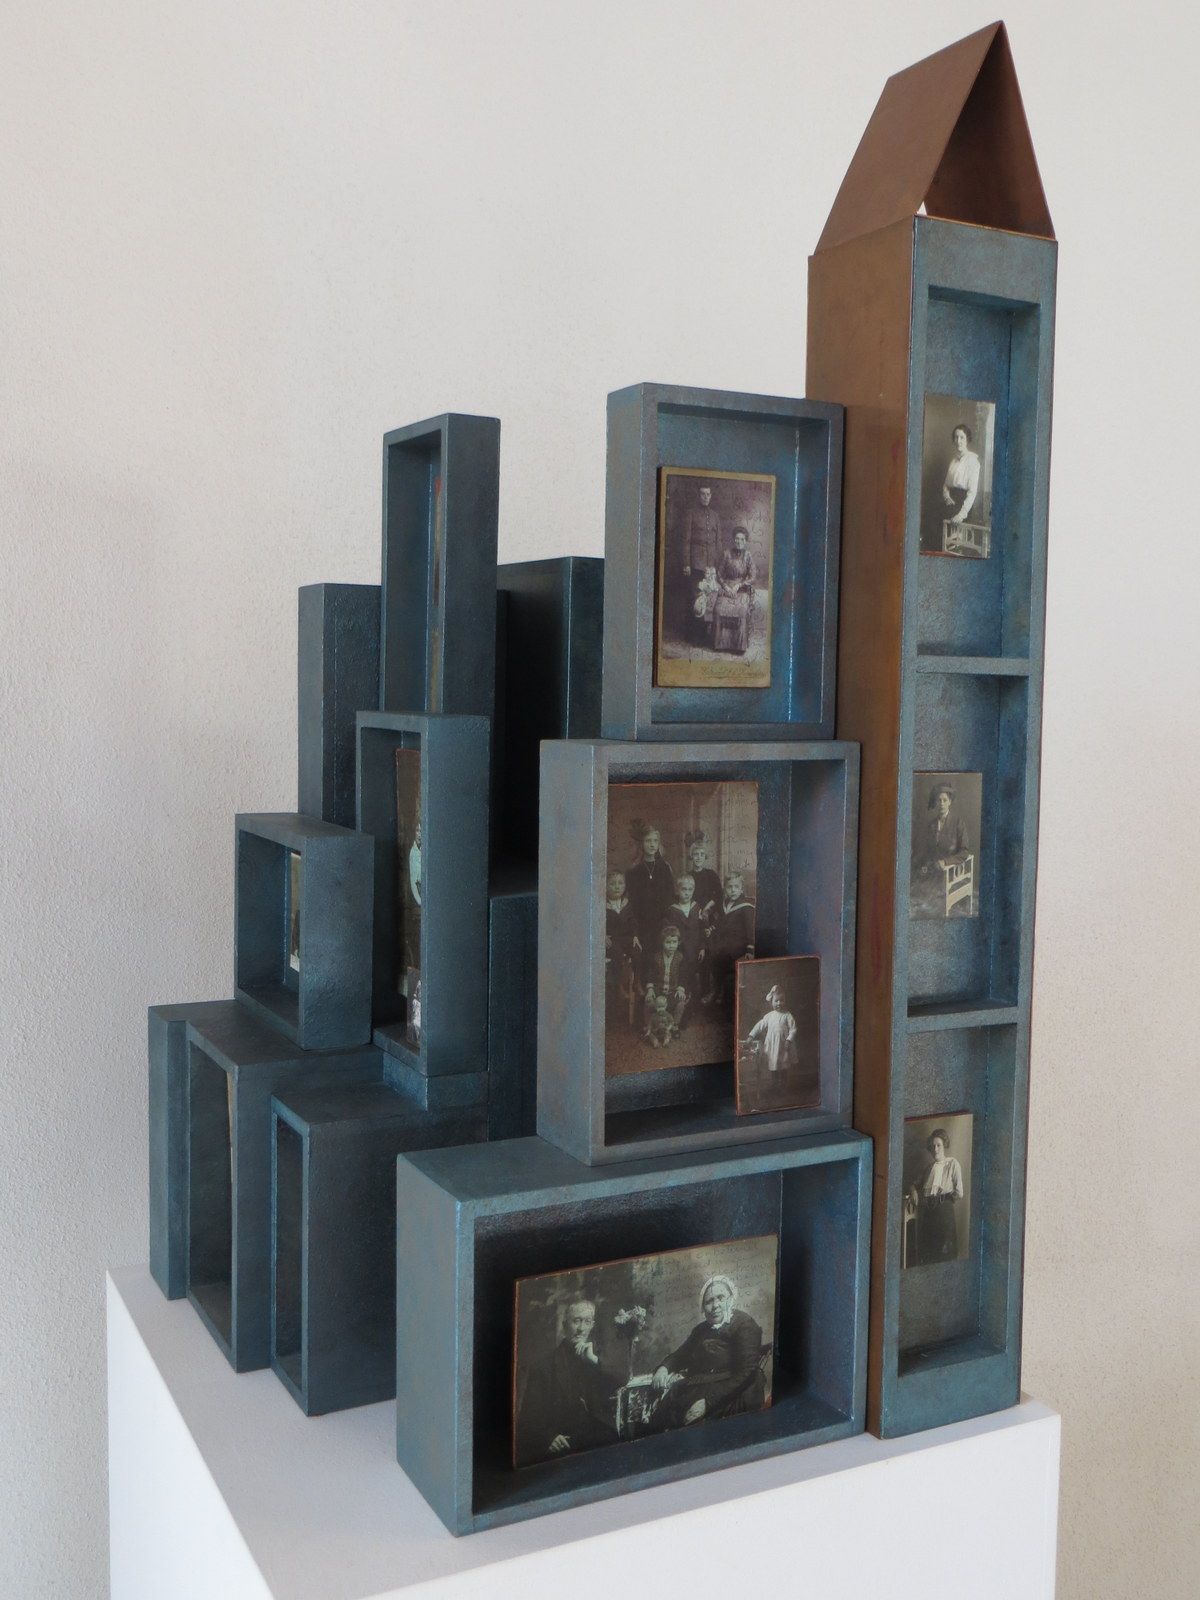 2012<br>40 x 40 x 68 cm<br>photographs, mdf, copper